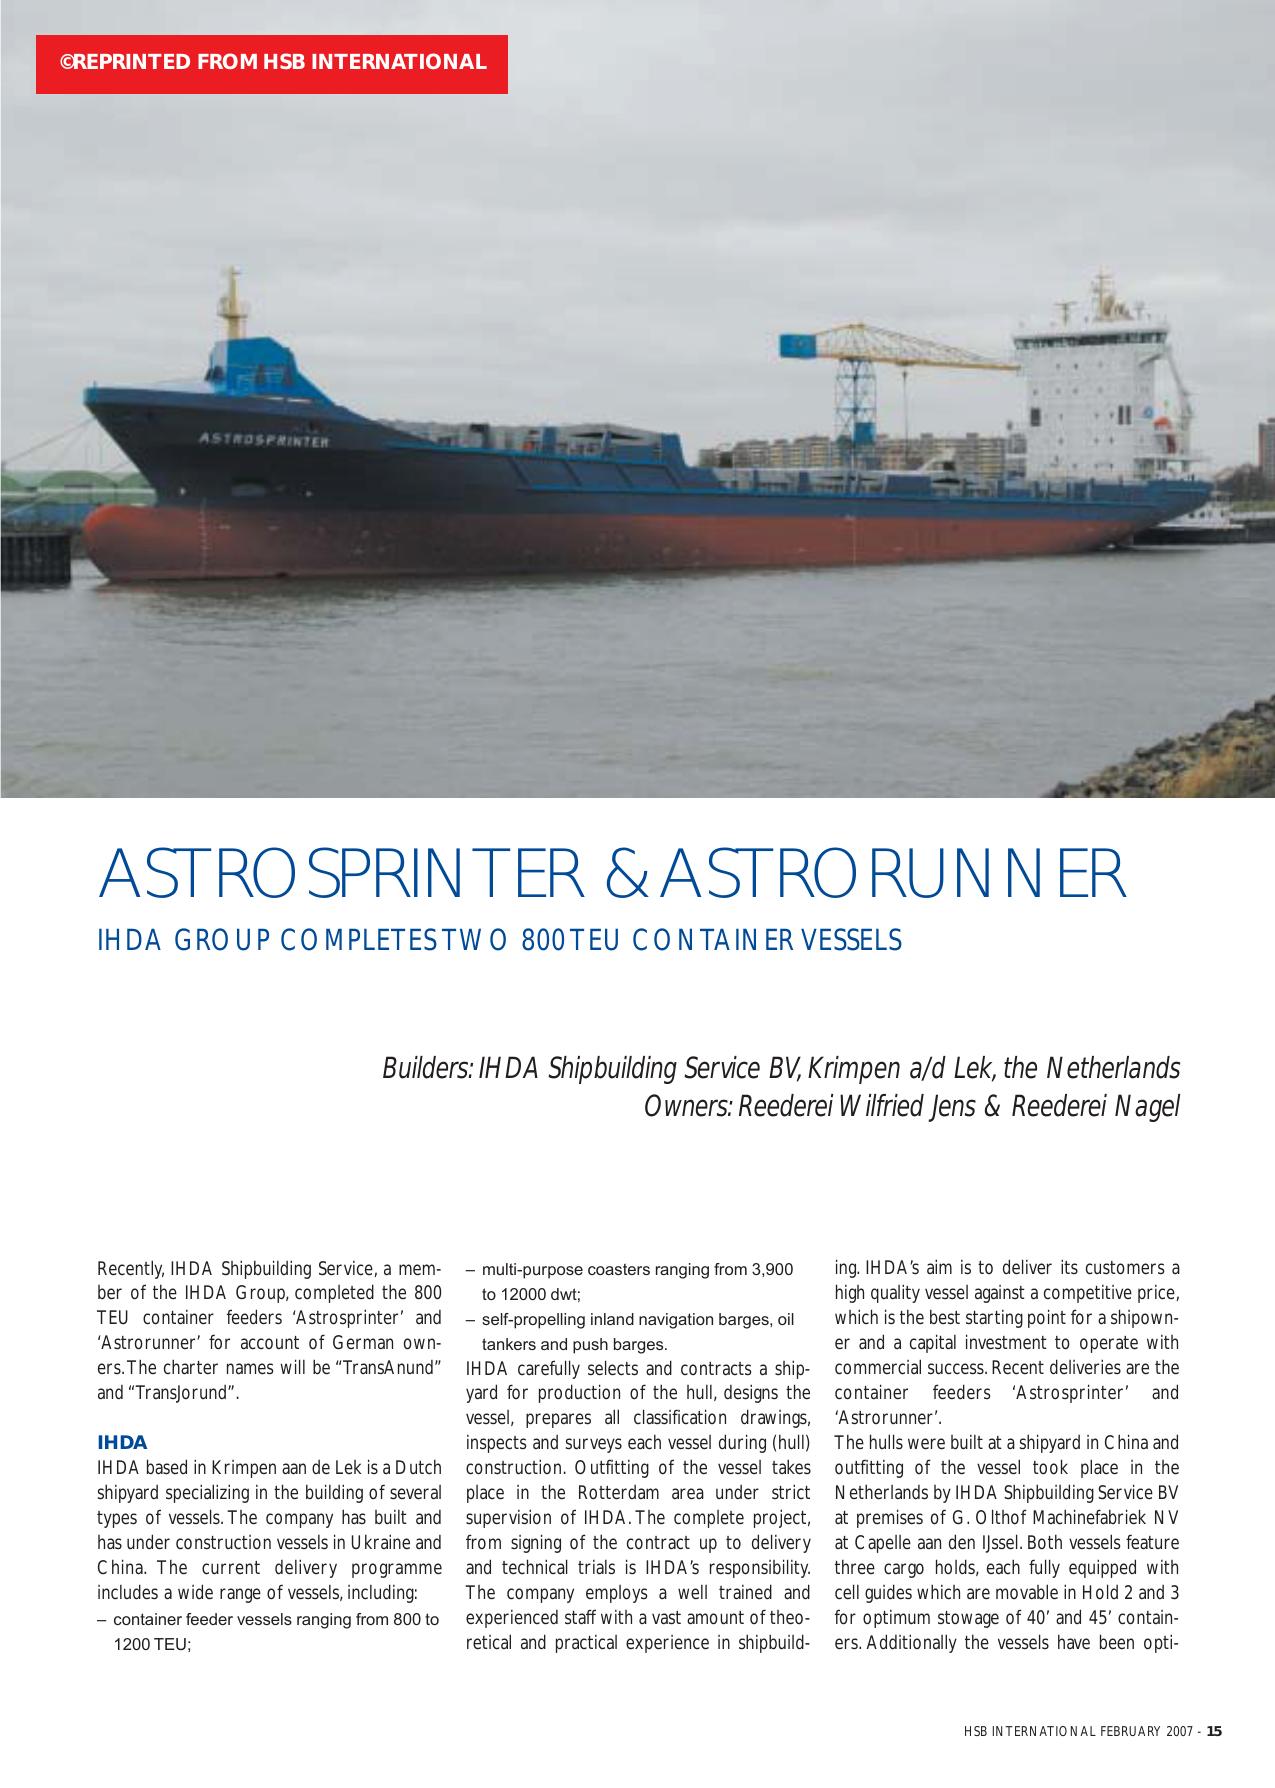 Astrorunner/ Sprinter - Adobe Experience Manager | manualzz com